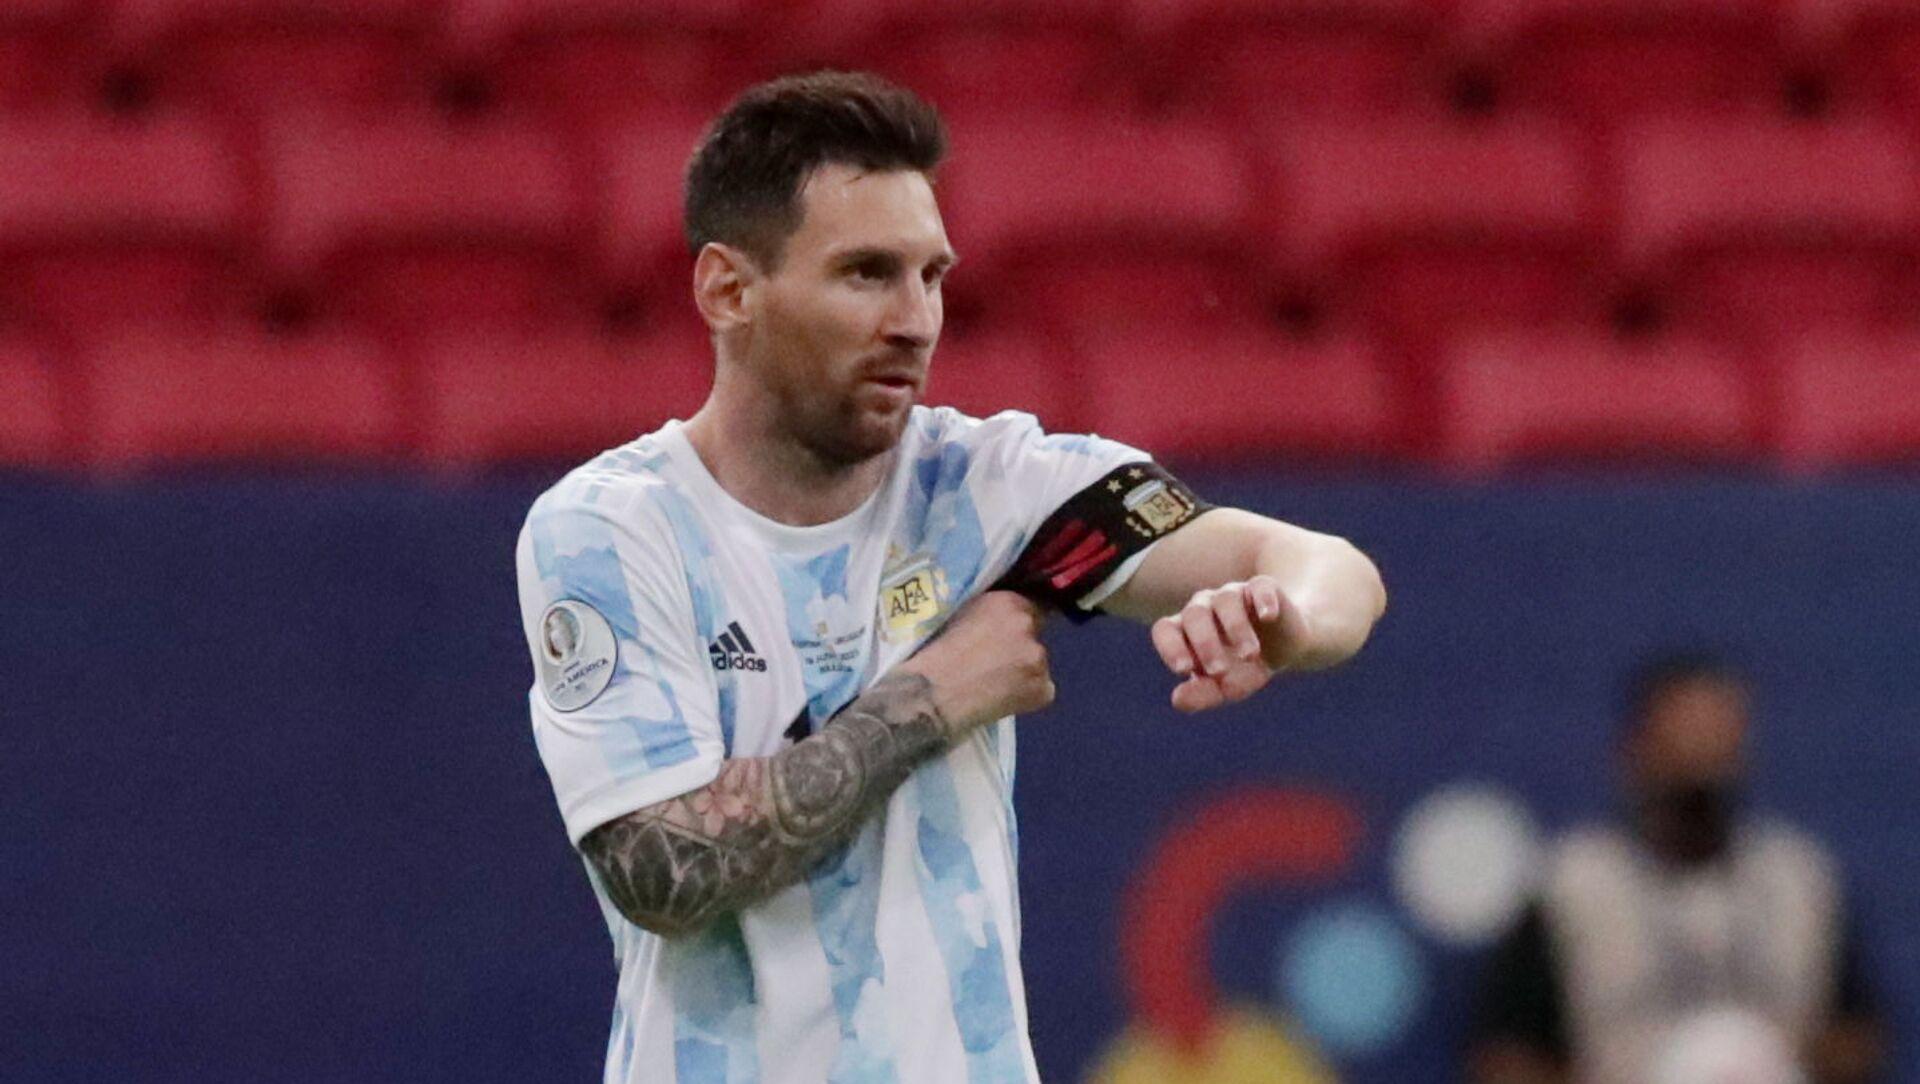 Soccer Football - Copa America 2021 - Group A - Argentina v Uruguay - Estadio Mane Garrincha, Brasilia, Brazil - June 18, 2021 Argentina's Lionel Messi - Sputnik International, 1920, 23.07.2021